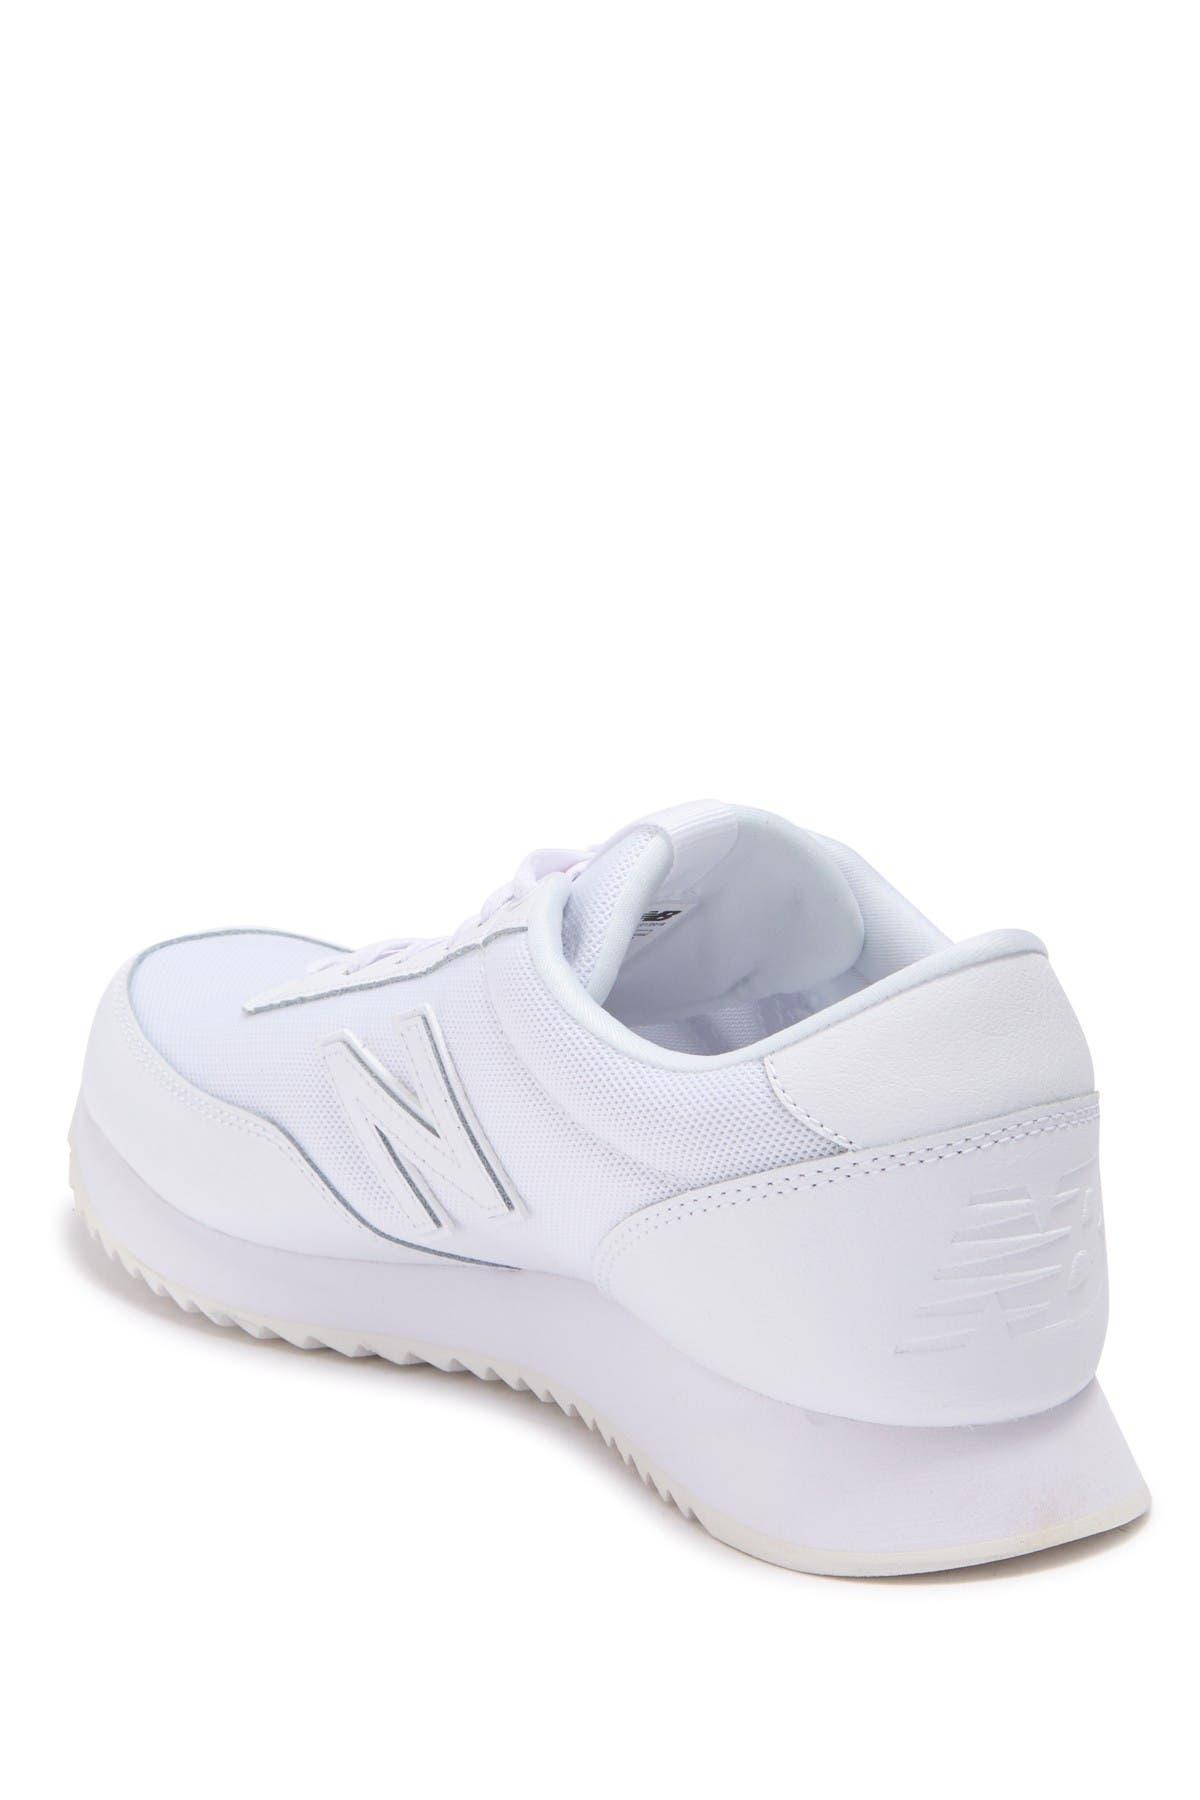 Image of New Balance X90 FTWR Sneaker